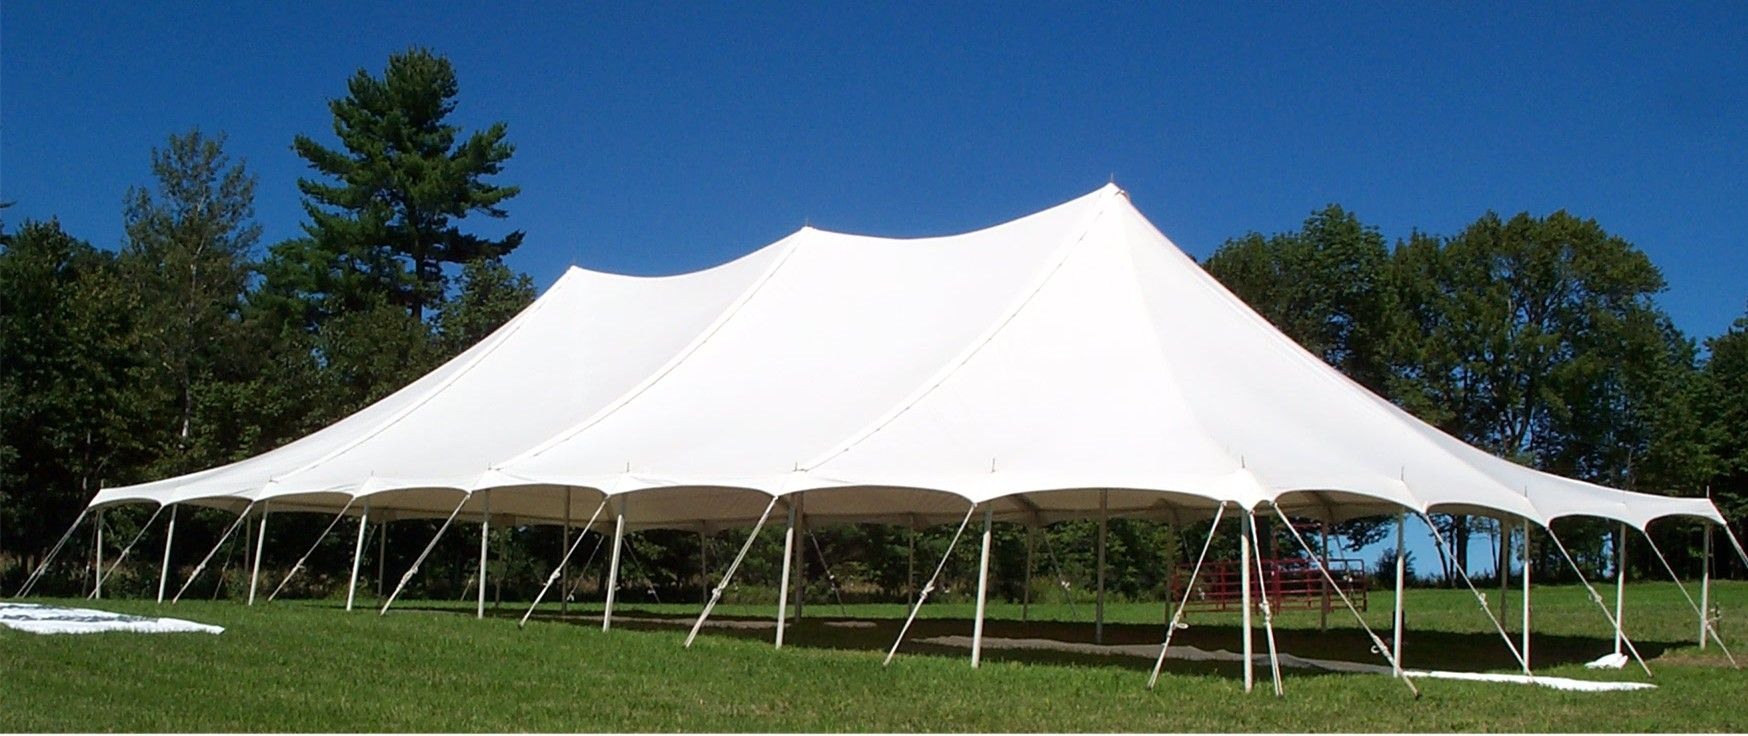 Tent Rope And Pole 40 X 80 Tent Rentals Tent Party Tent Rentals